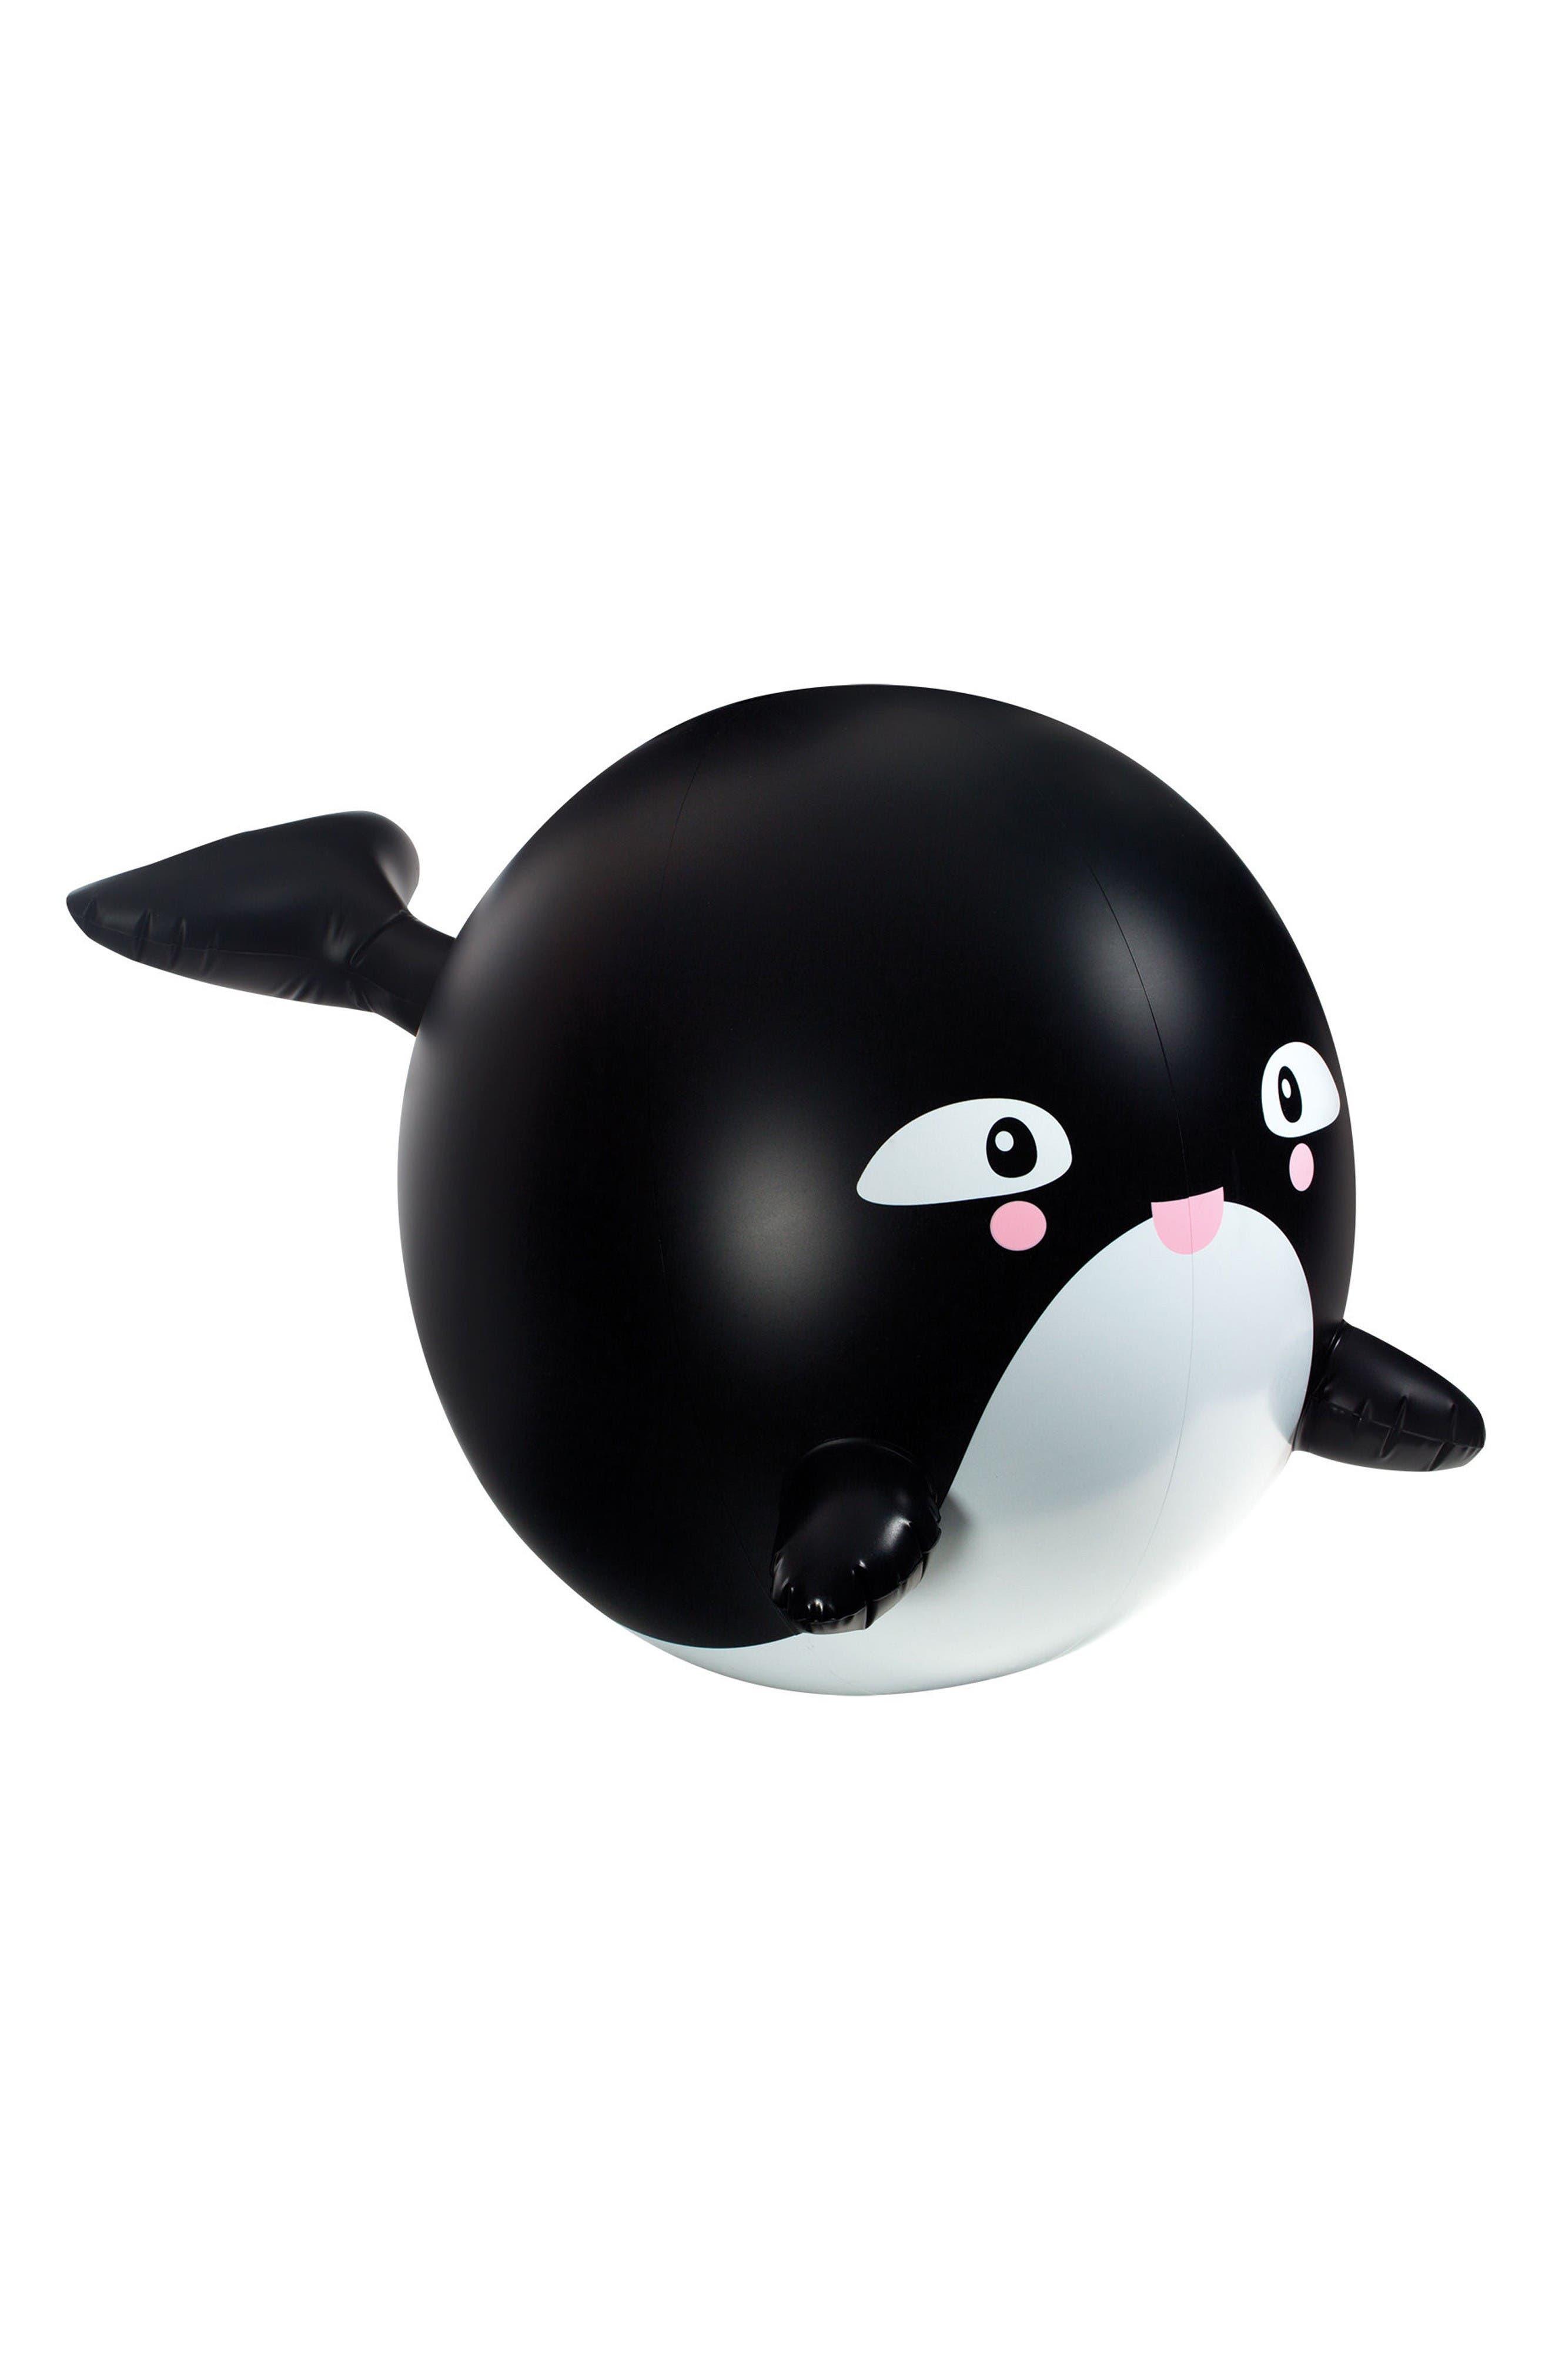 Toysmith Sprinkler Buddies - Orca Whale Inflatable Sprinkler